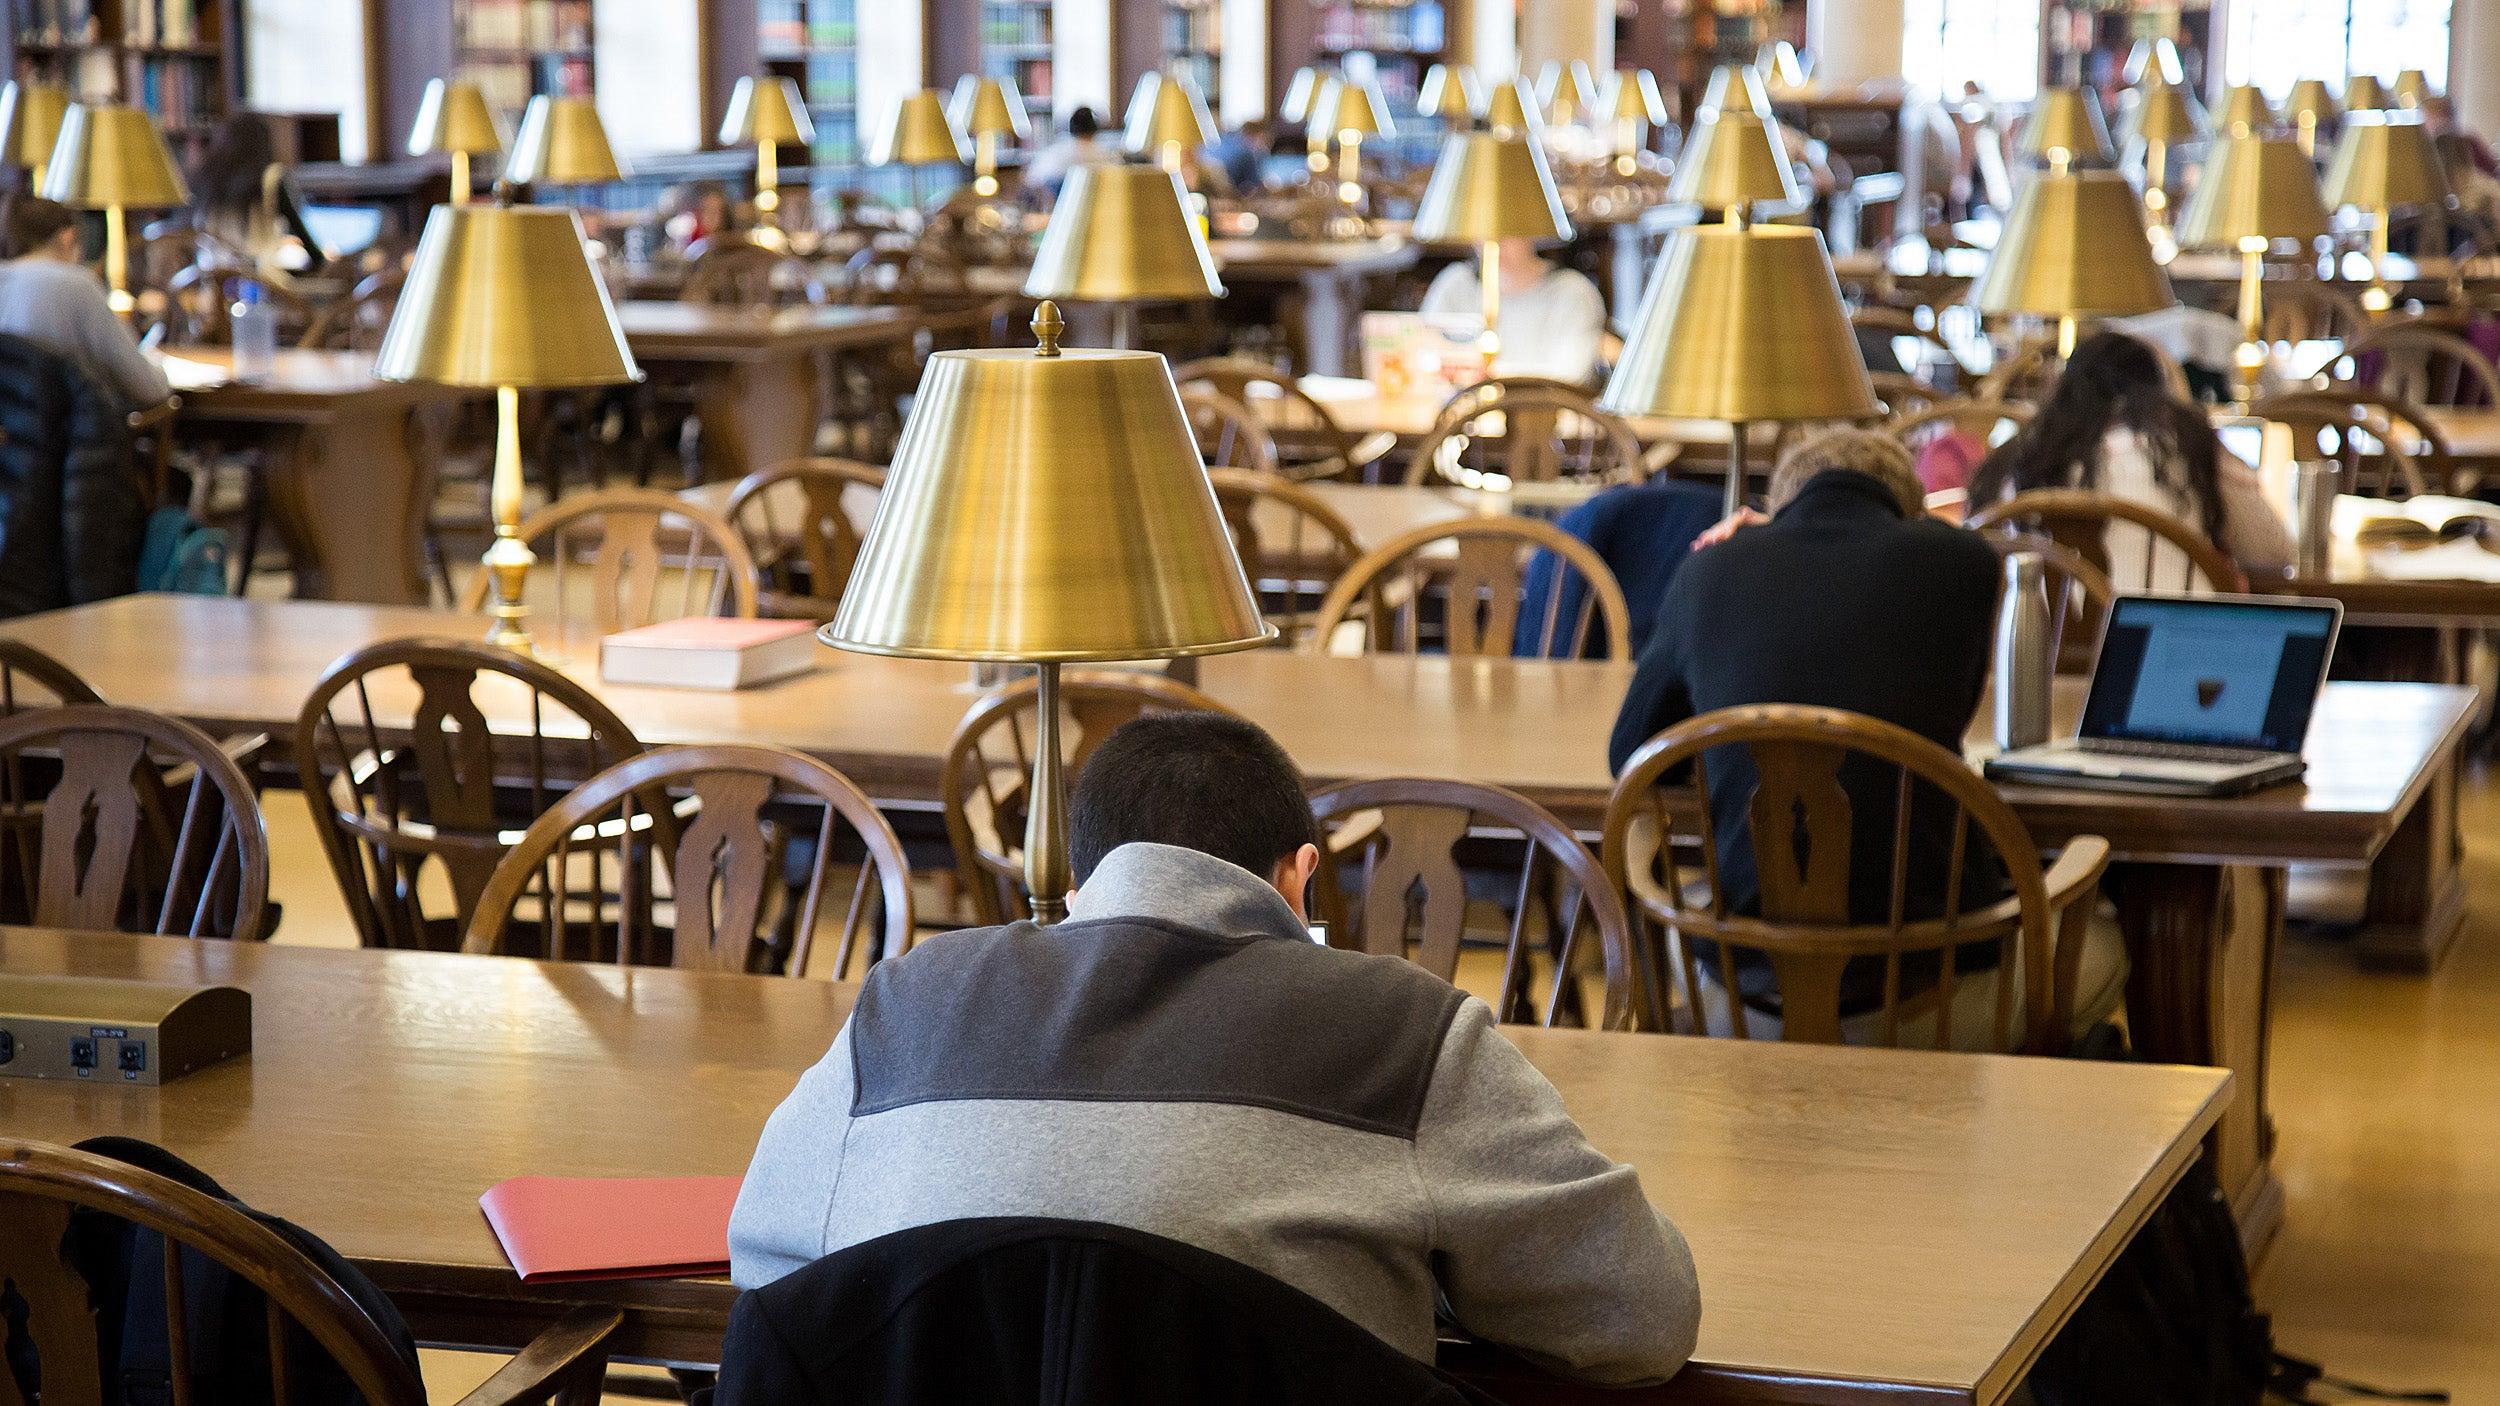 Gold lamps glimmer in Widener Library's Loker Reading Room.